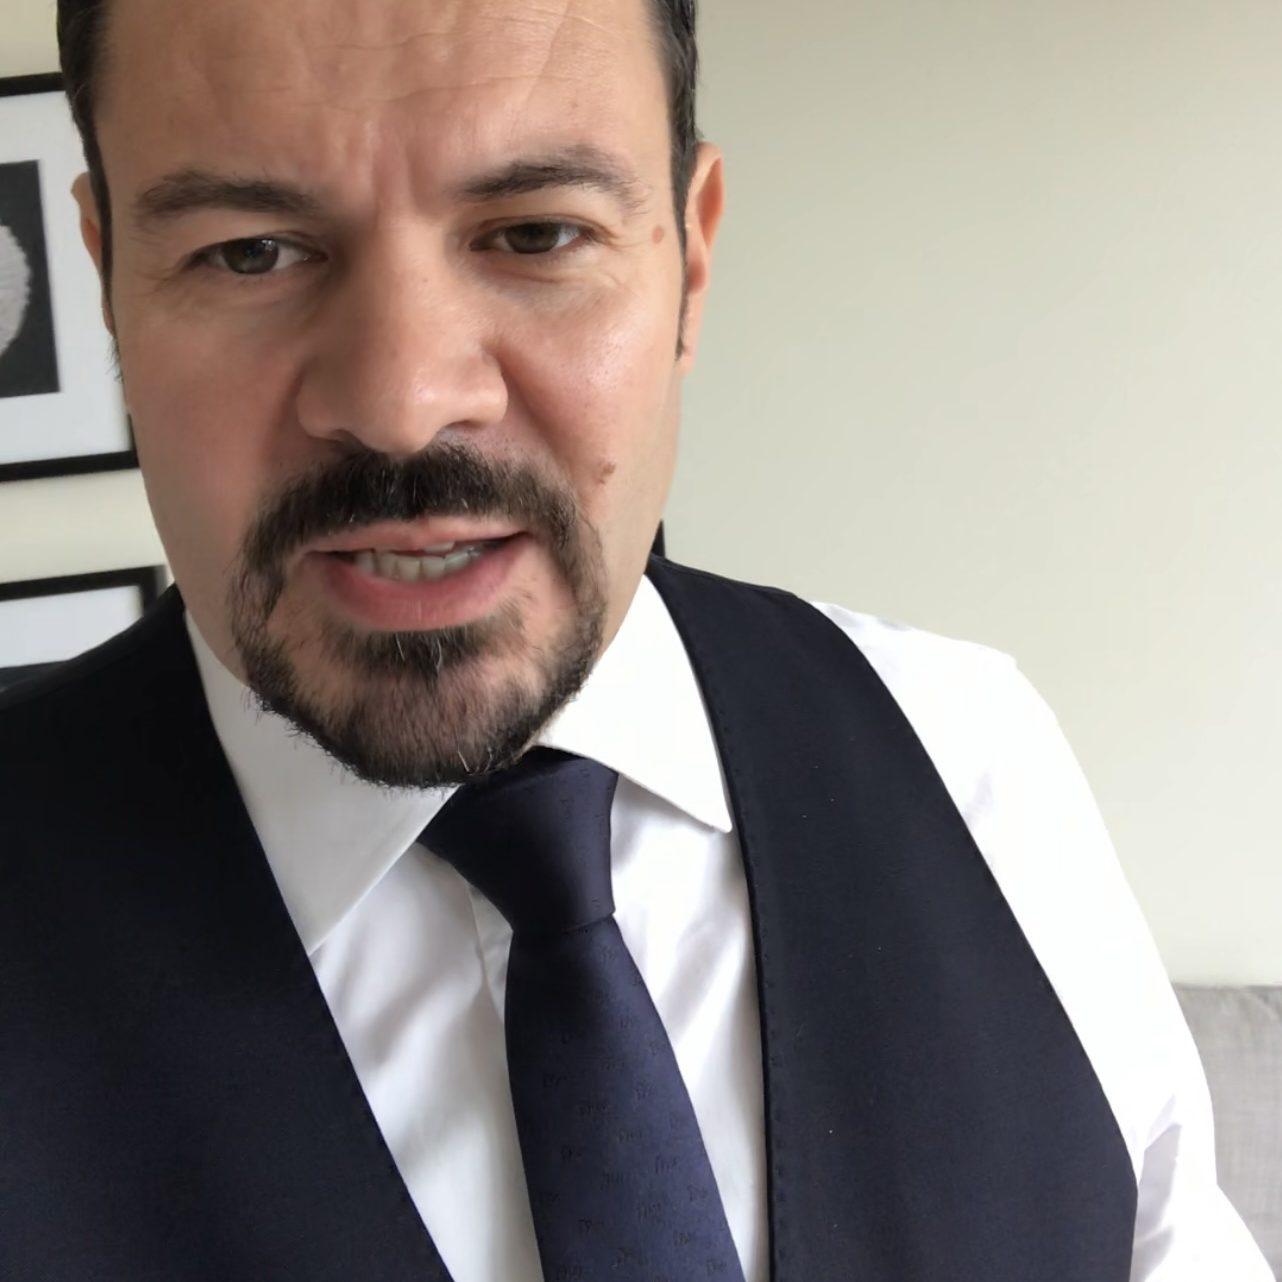 John M in a suit